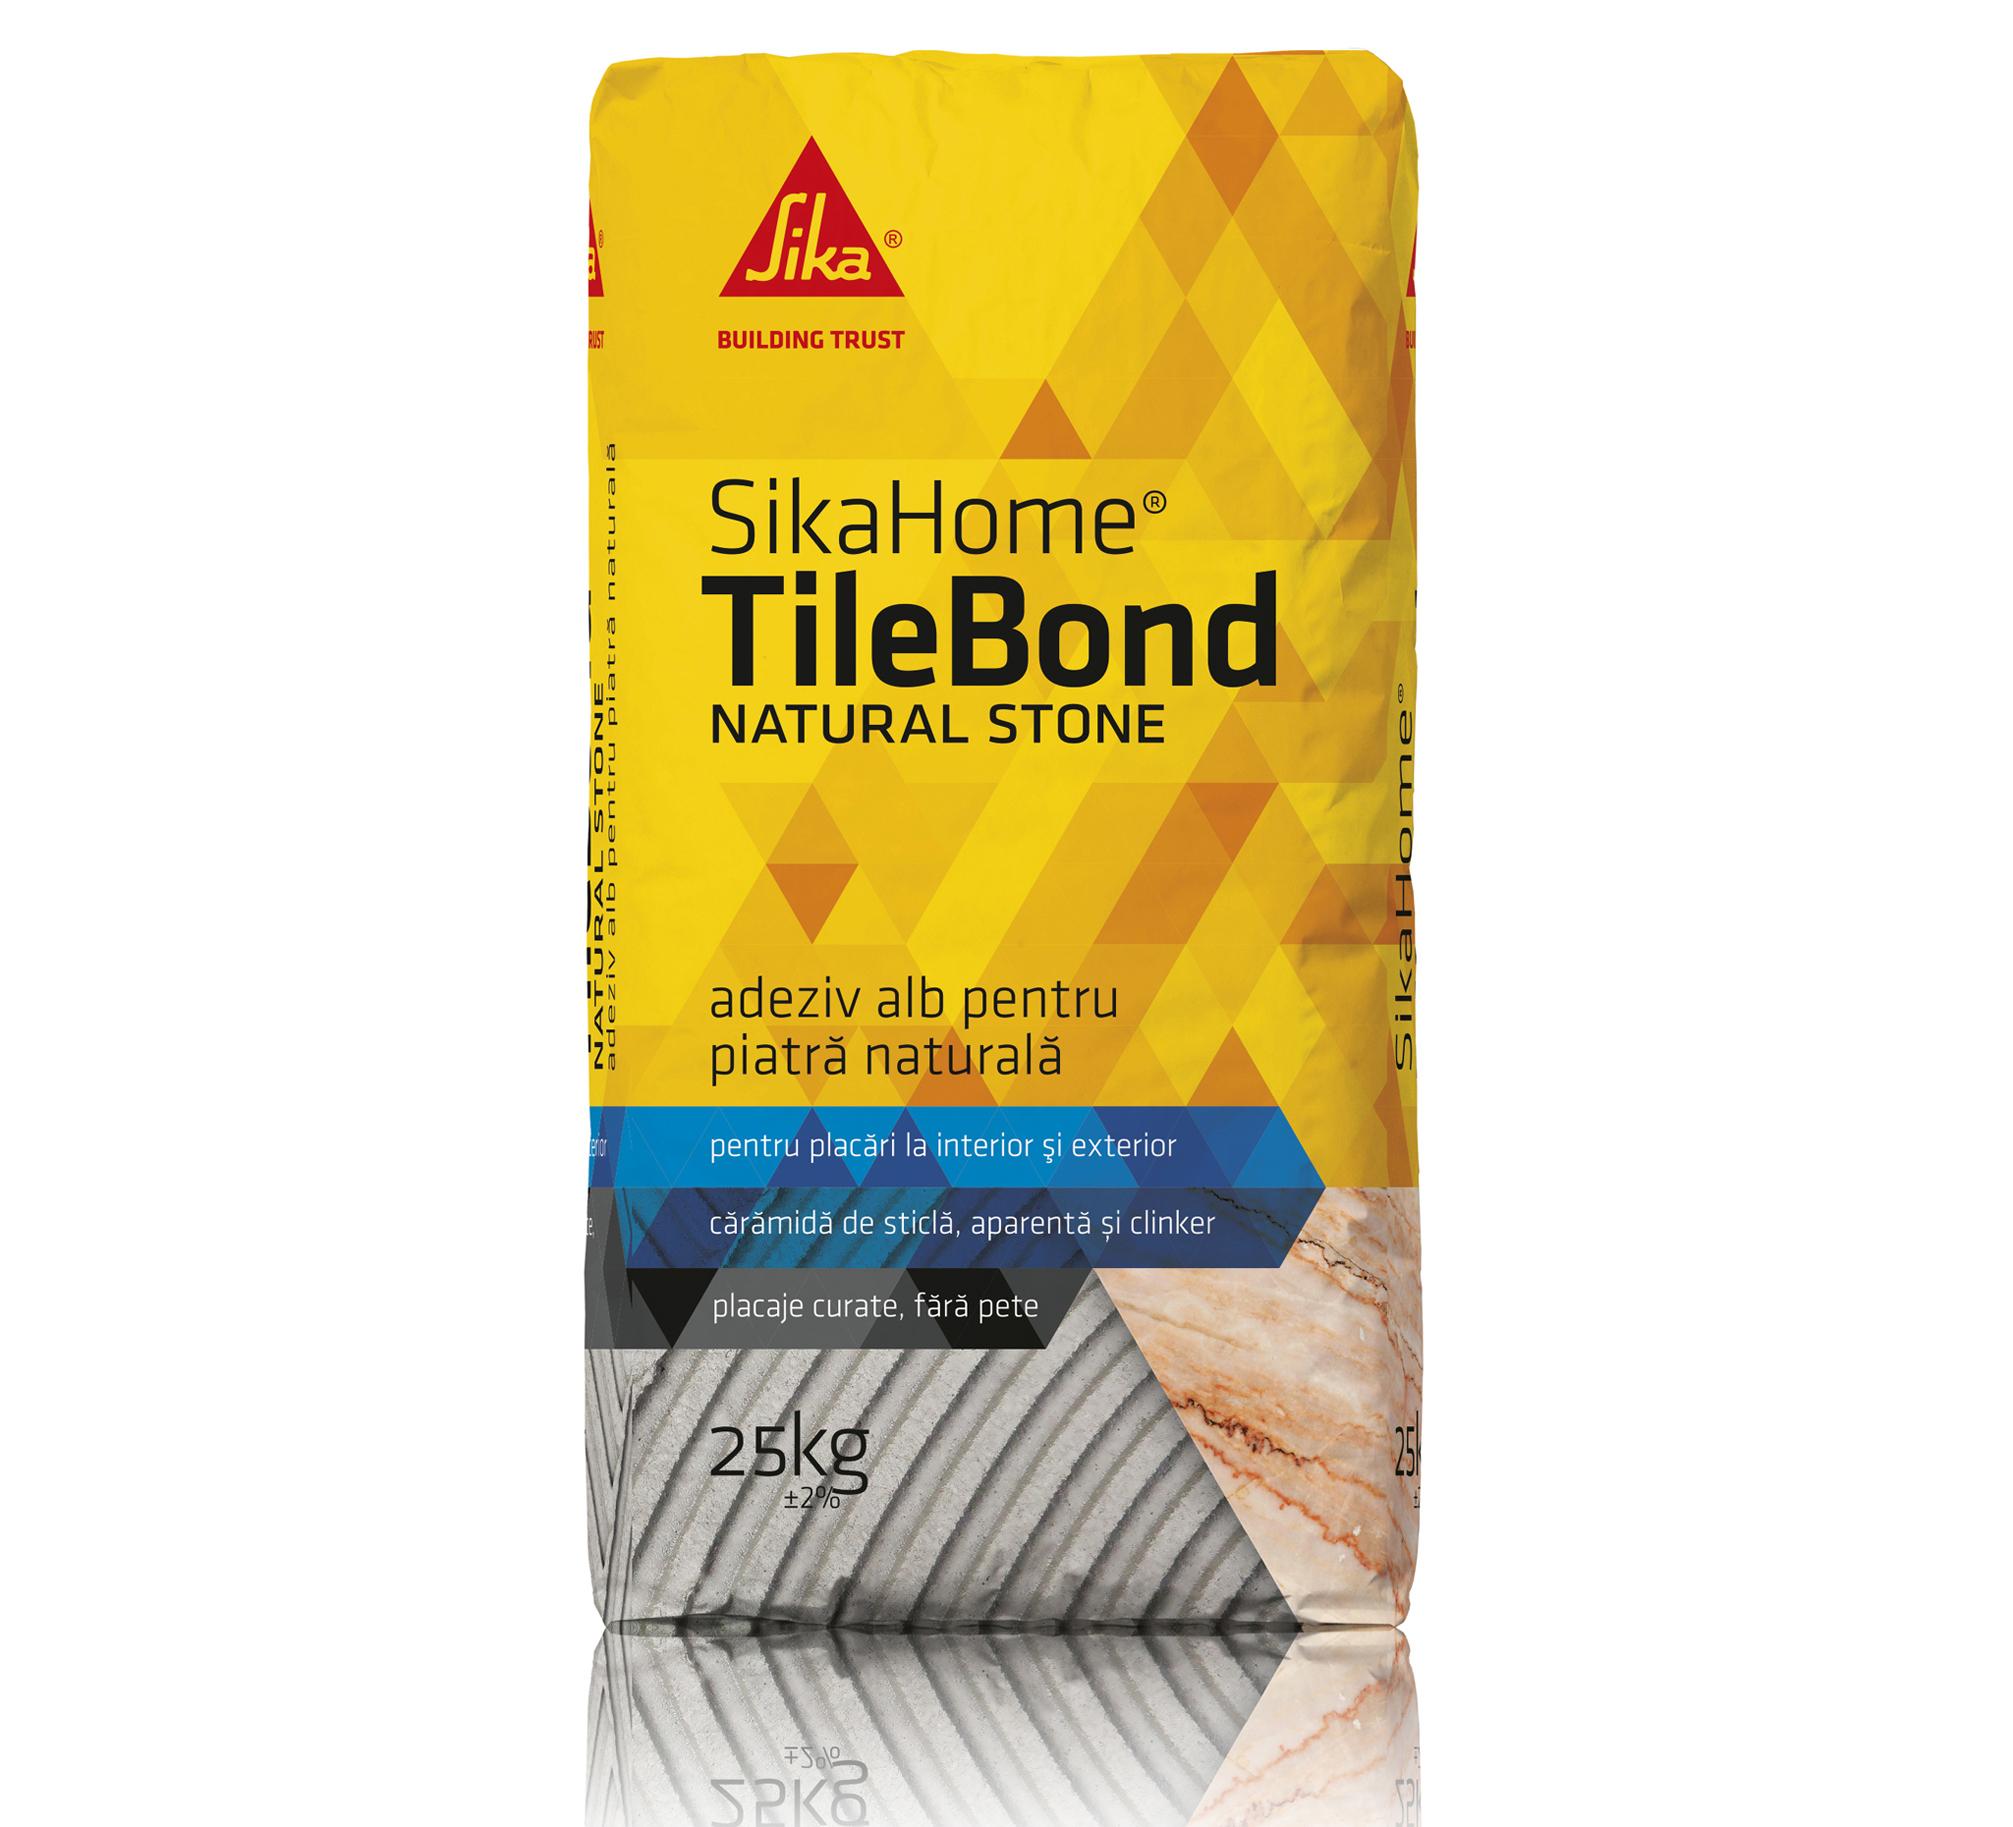 SikaHome TileBond NATURAL STONE - SikaHome TileBond NATURAL STONE